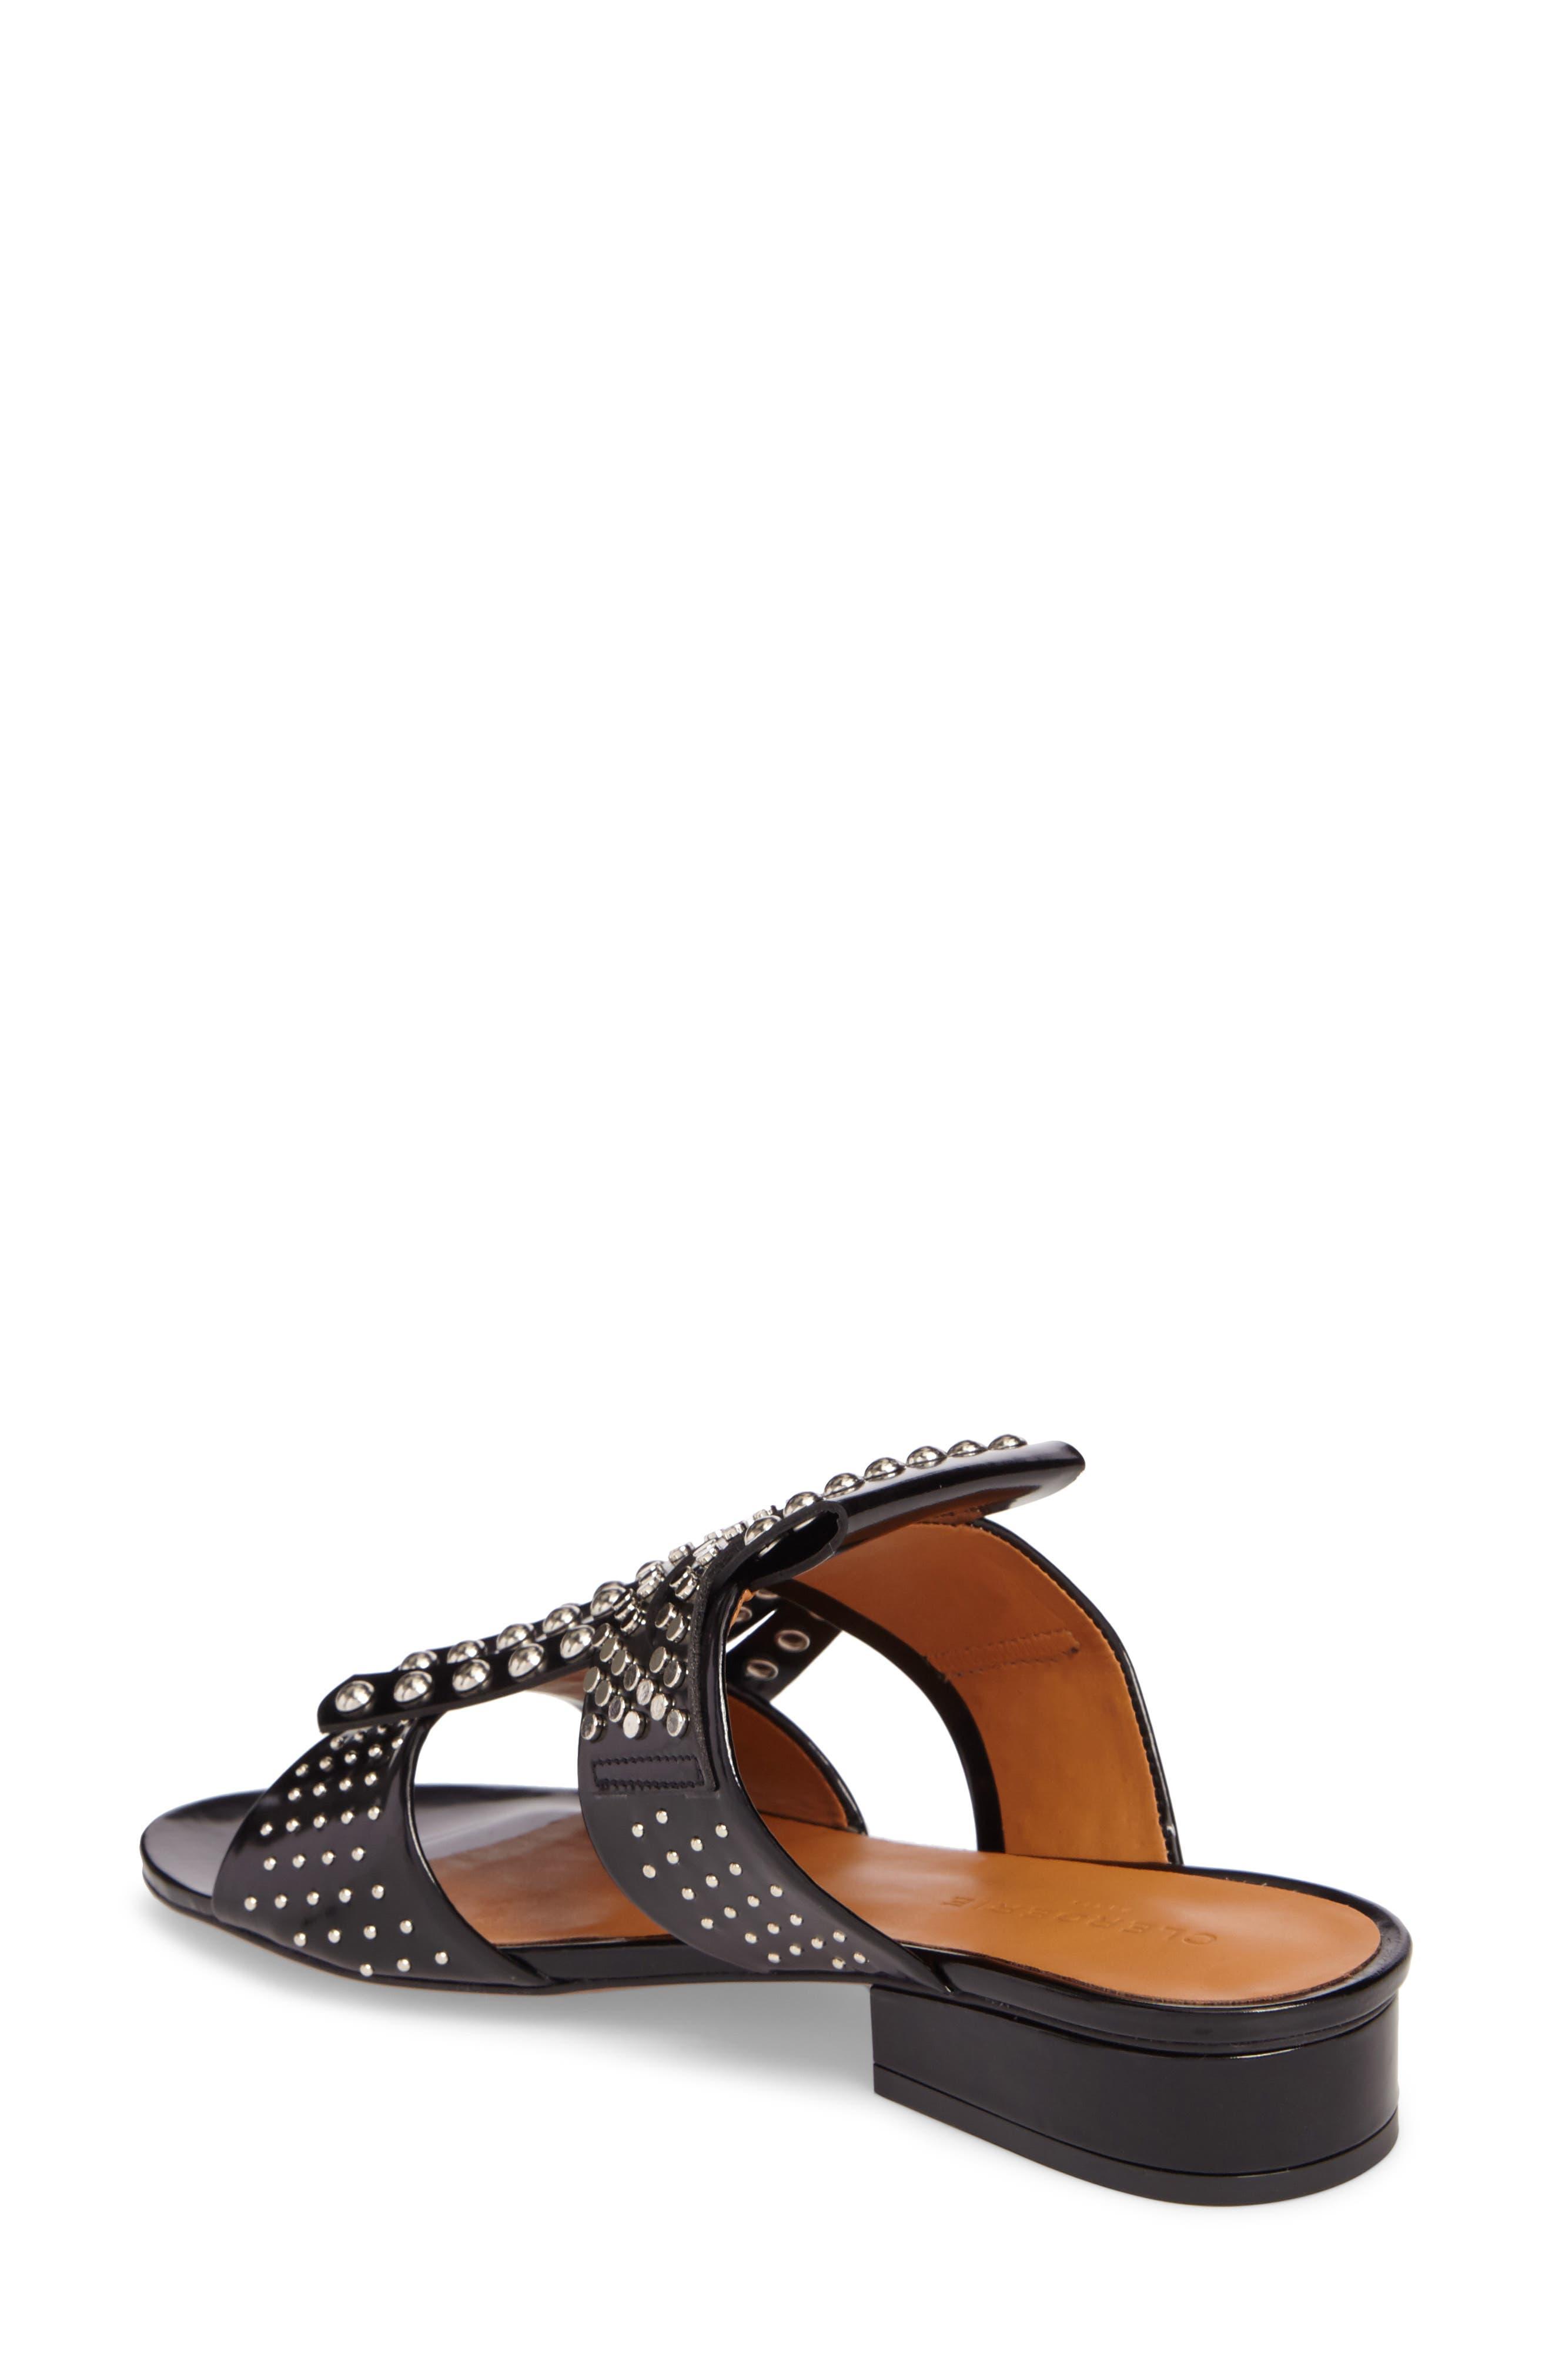 Figlouc Studded Sandal,                             Alternate thumbnail 2, color,                             Black